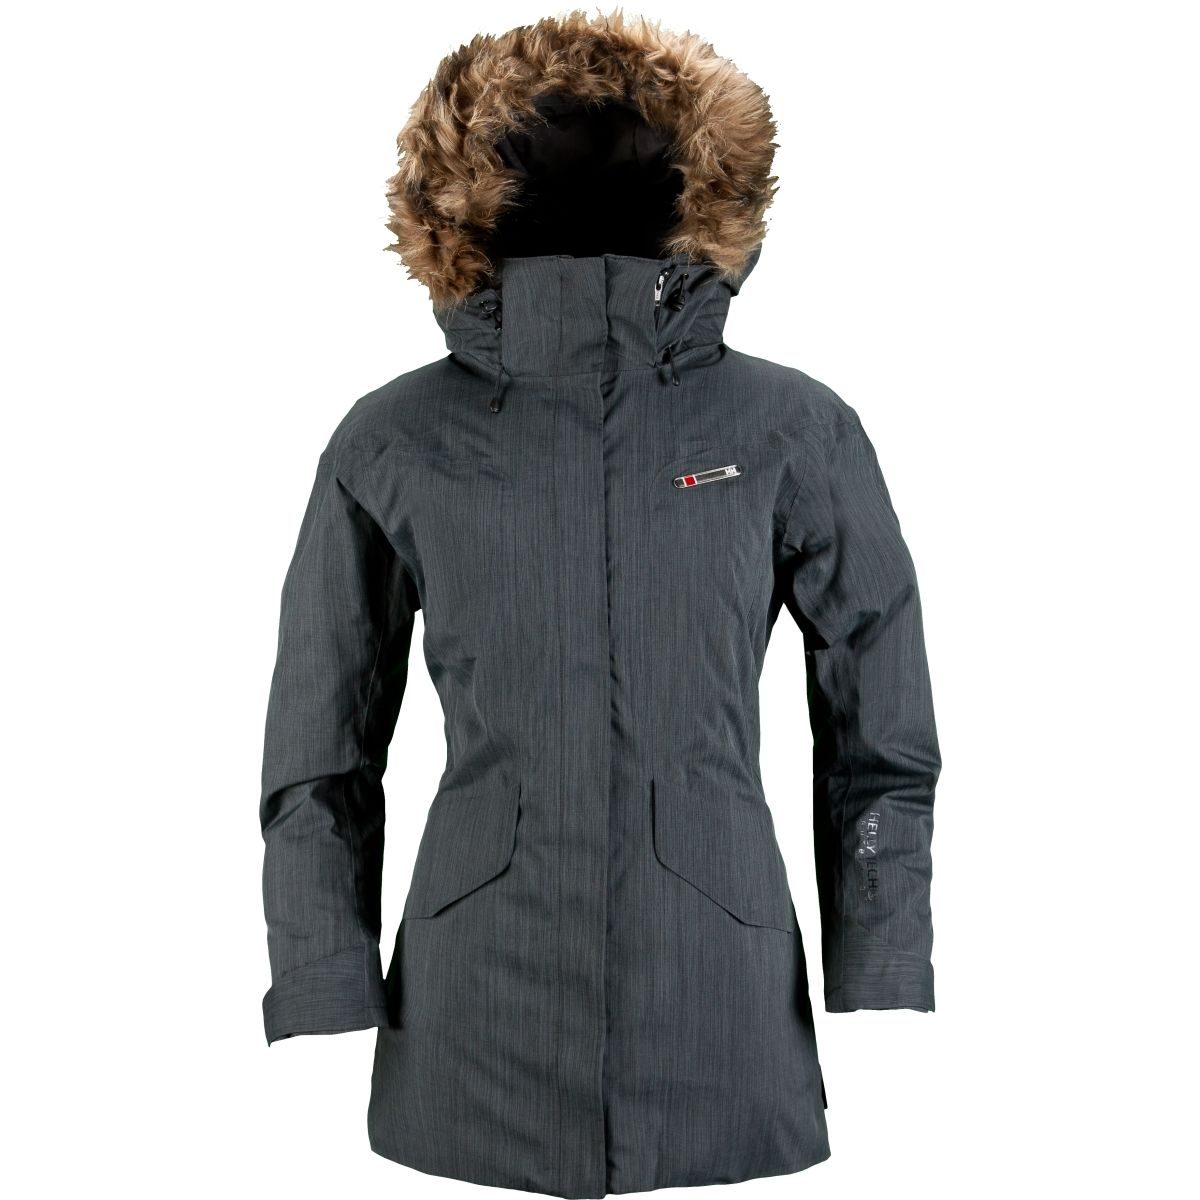 Helly Hansen Women's Clearance Ski Jackets